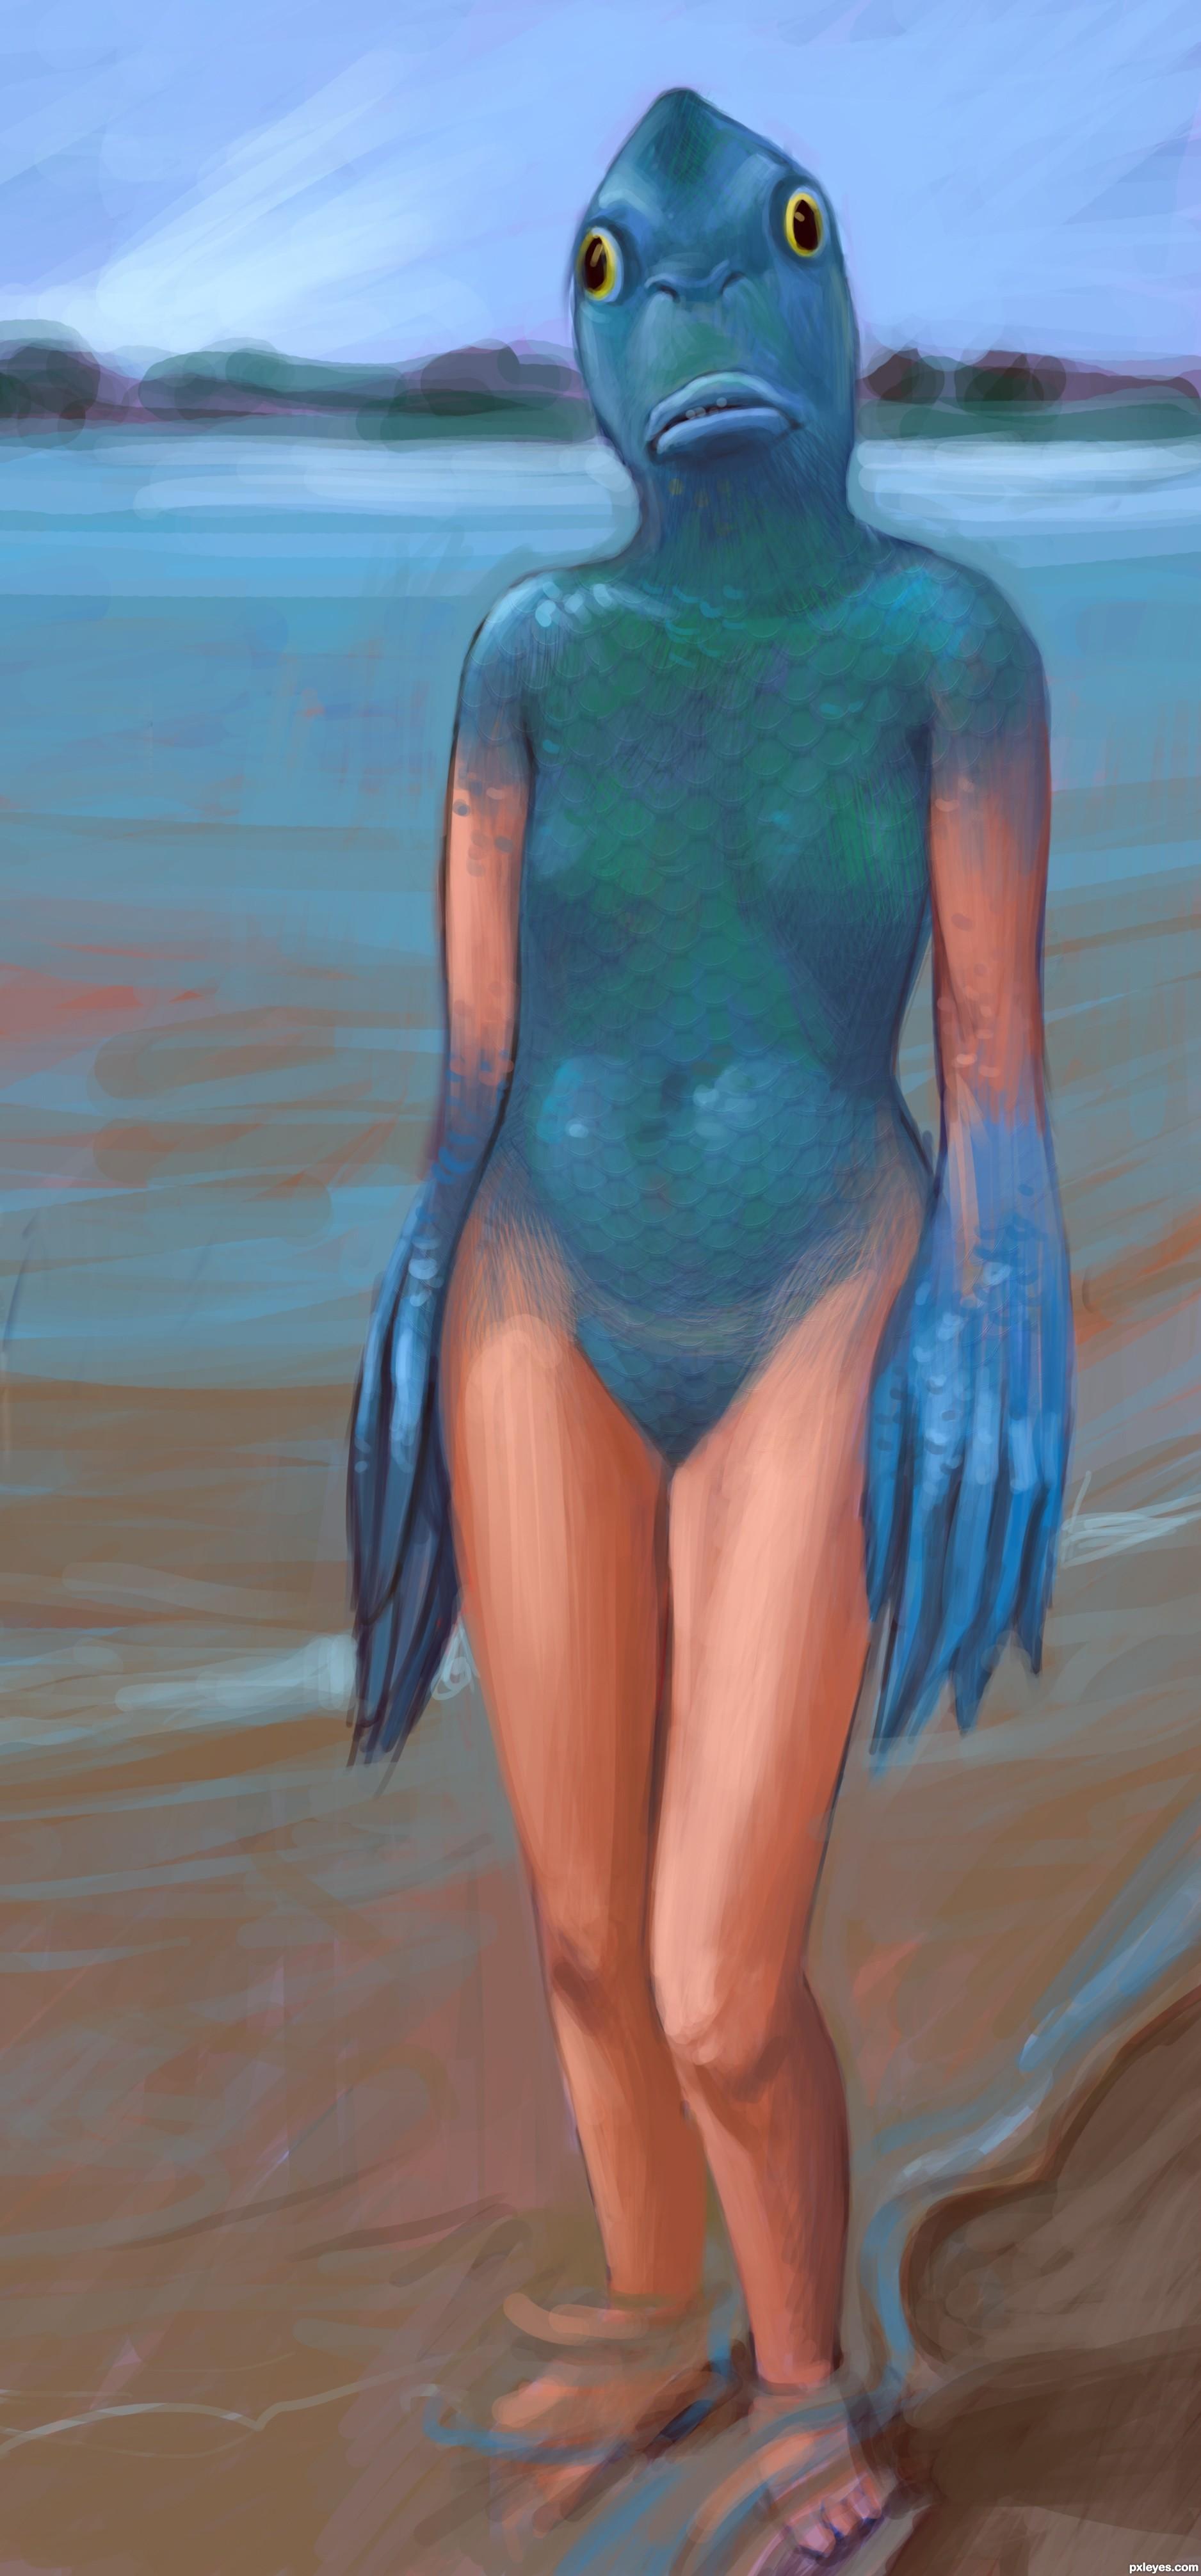 reverse-mermaid-4e788d5285364_hires.jpg